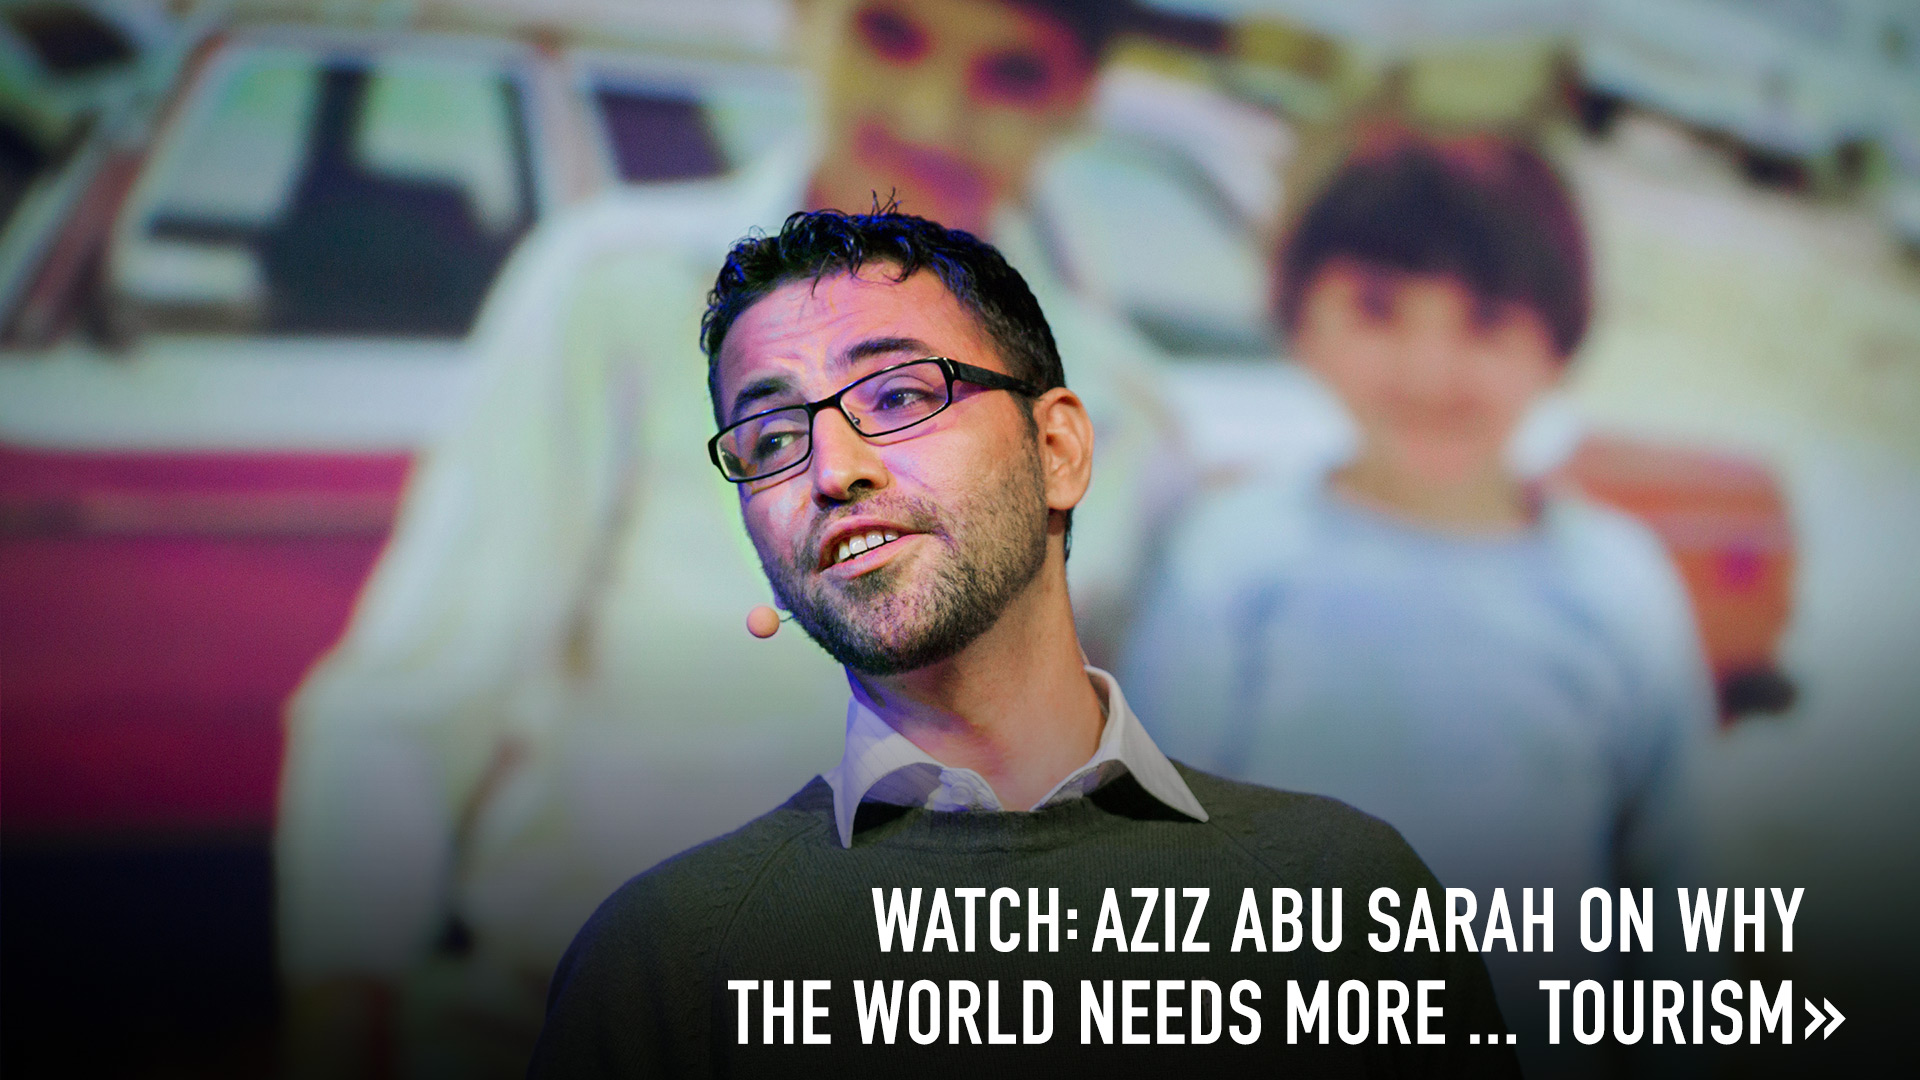 Aziz_Abu_Sarah_linkable_image